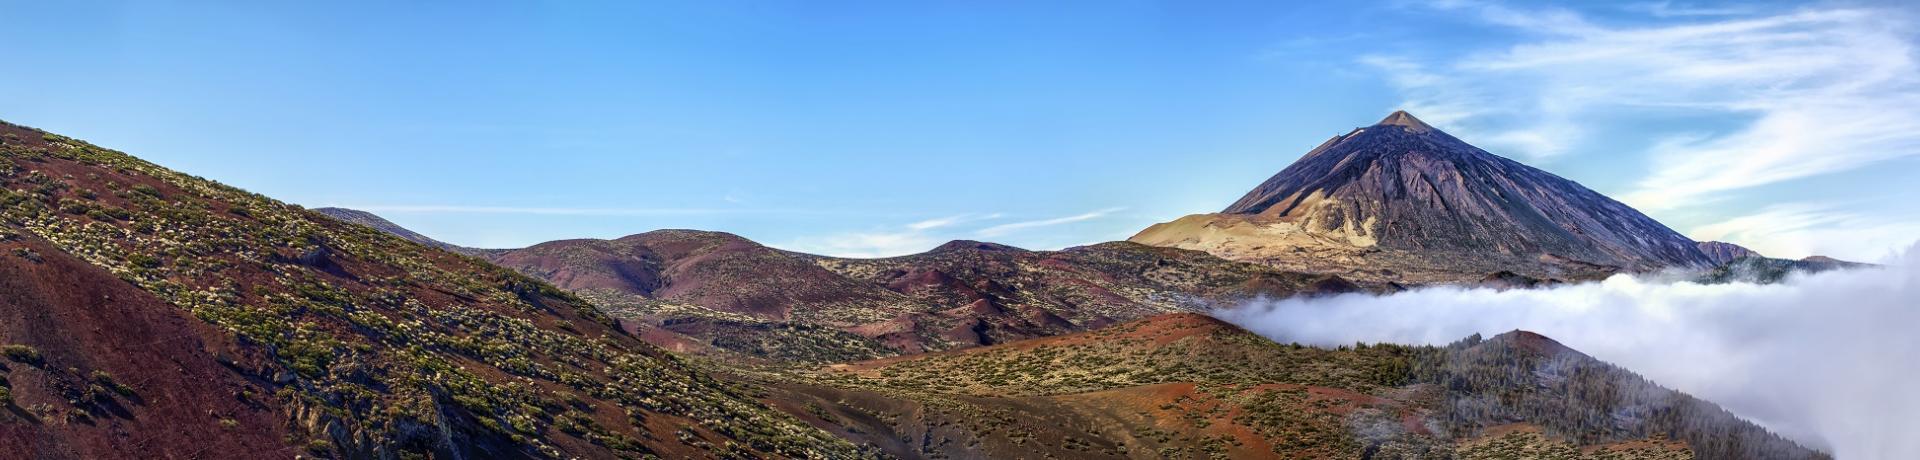 Spanien: Teneriffa - Pico del Teide Emotion